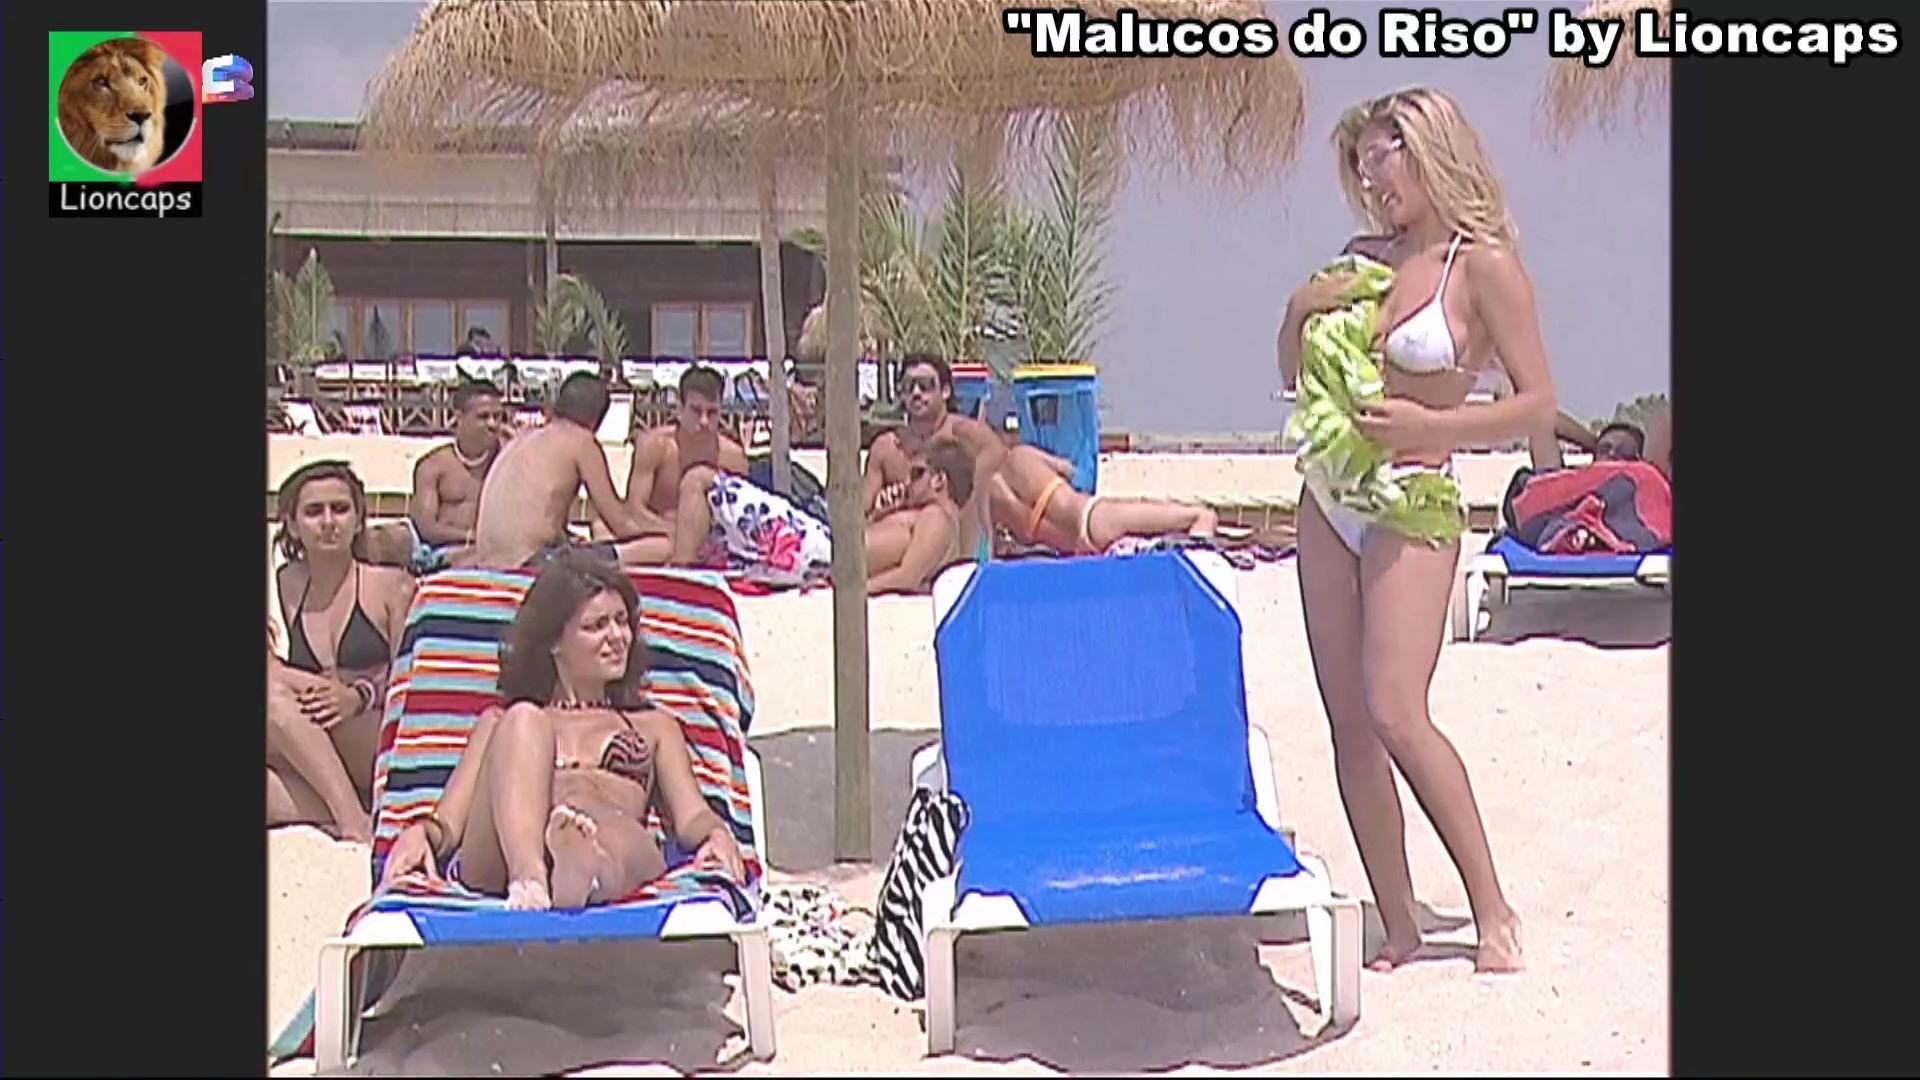 475145856_malucos_riso_alda_gomes_vs190malucos_riso_602_15059_122_152lo.JPG